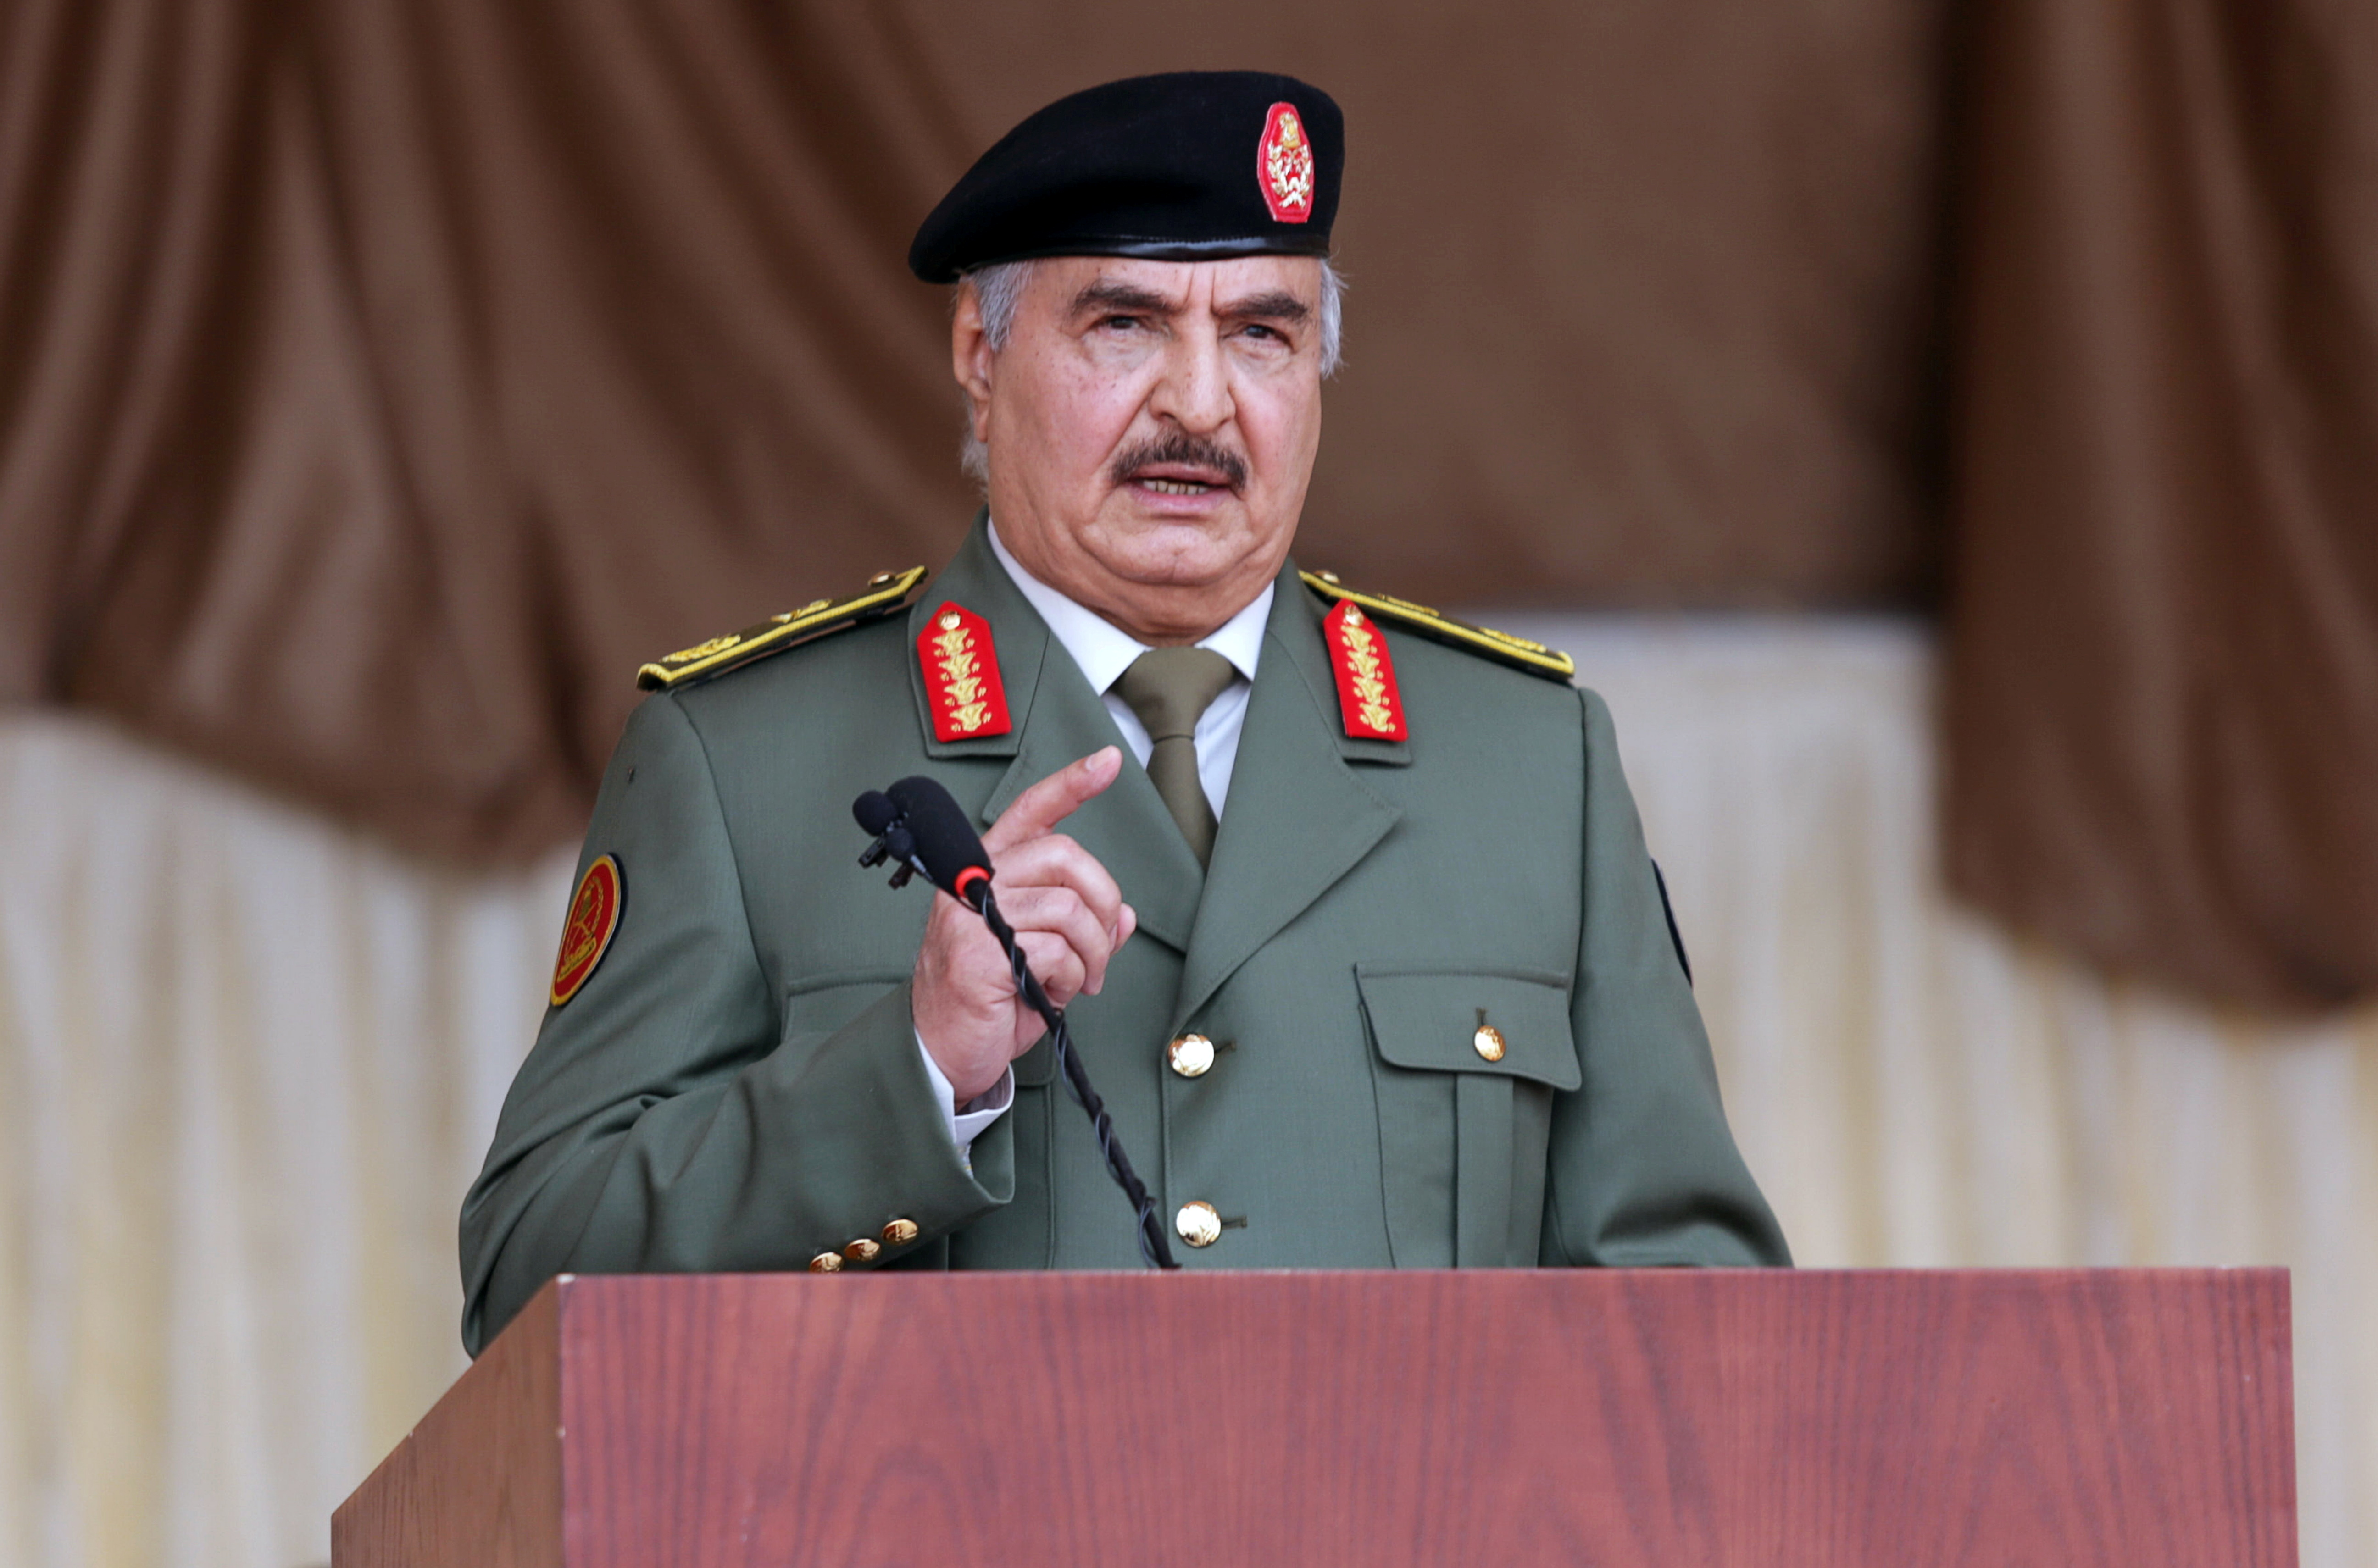 Libyan military commander Khalifa Haftar gestures as he speaks during Independence Day celebrations in Benghazi, Libya December 24, 2020. REUTERS/Esam Omran Al-Fetori/File Photo